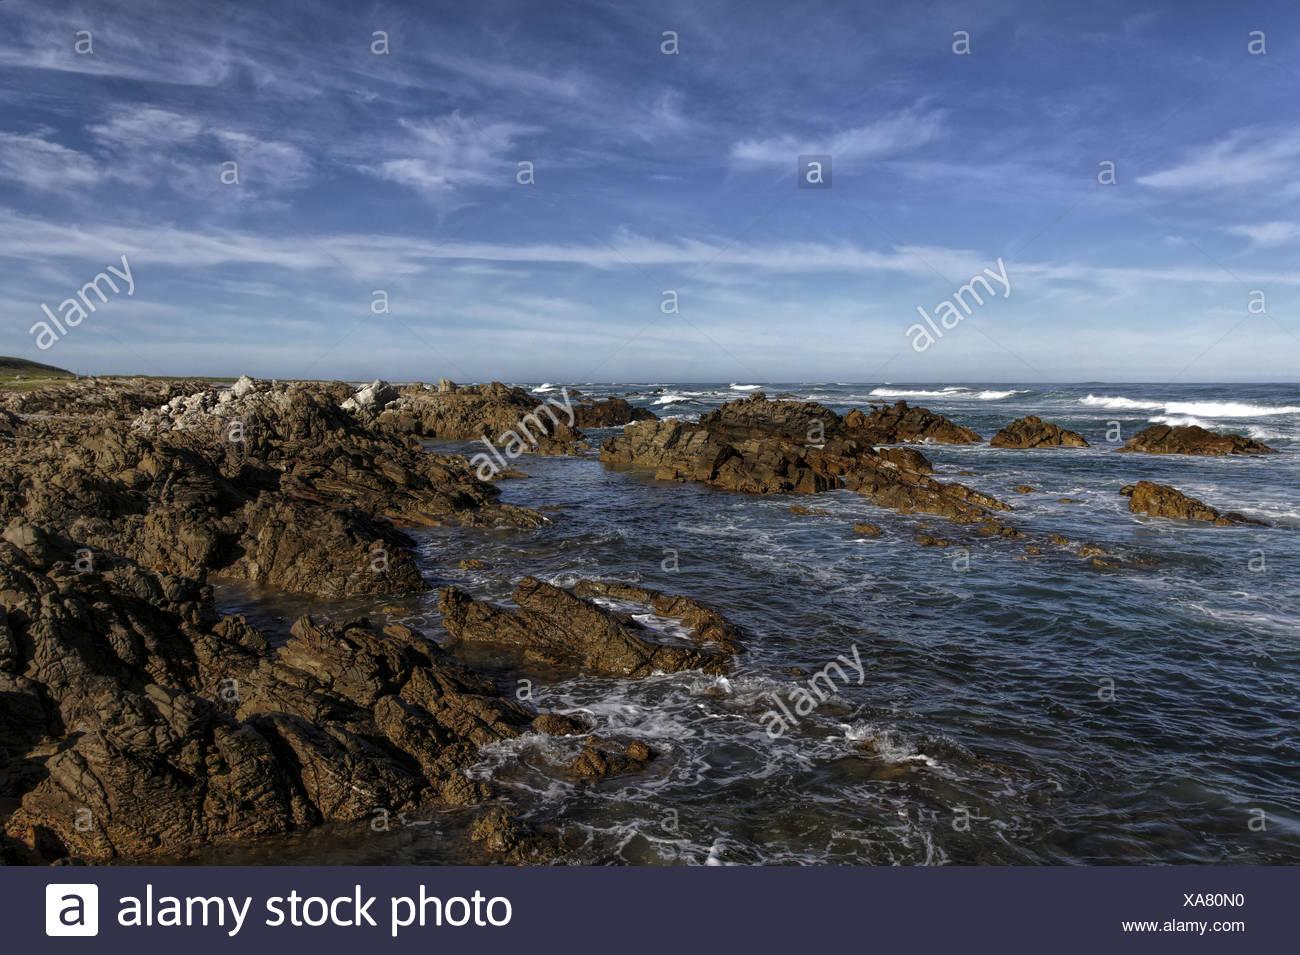 Cape Agulhas - Stock Image